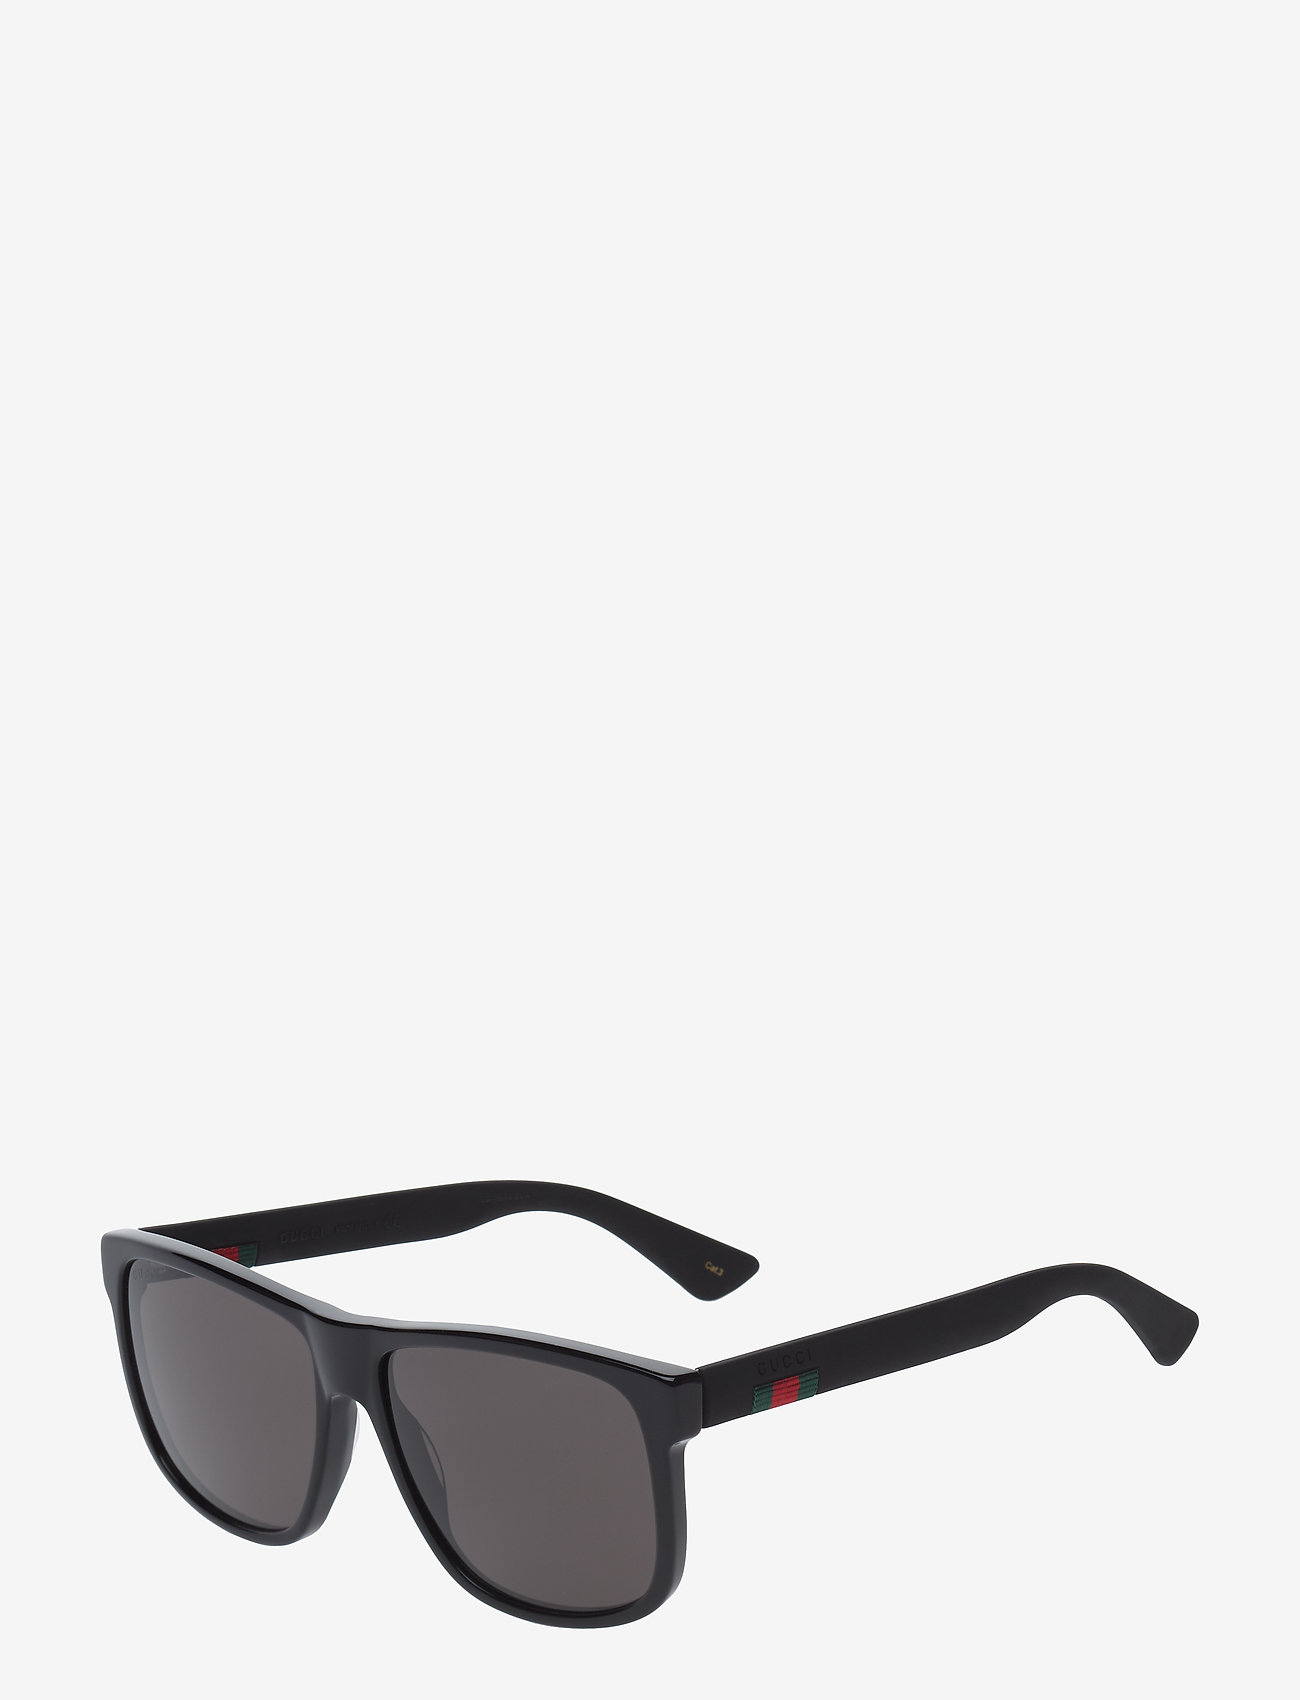 Gucci Sunglasses - GG0010S - d-muotoiset - black-black-grey